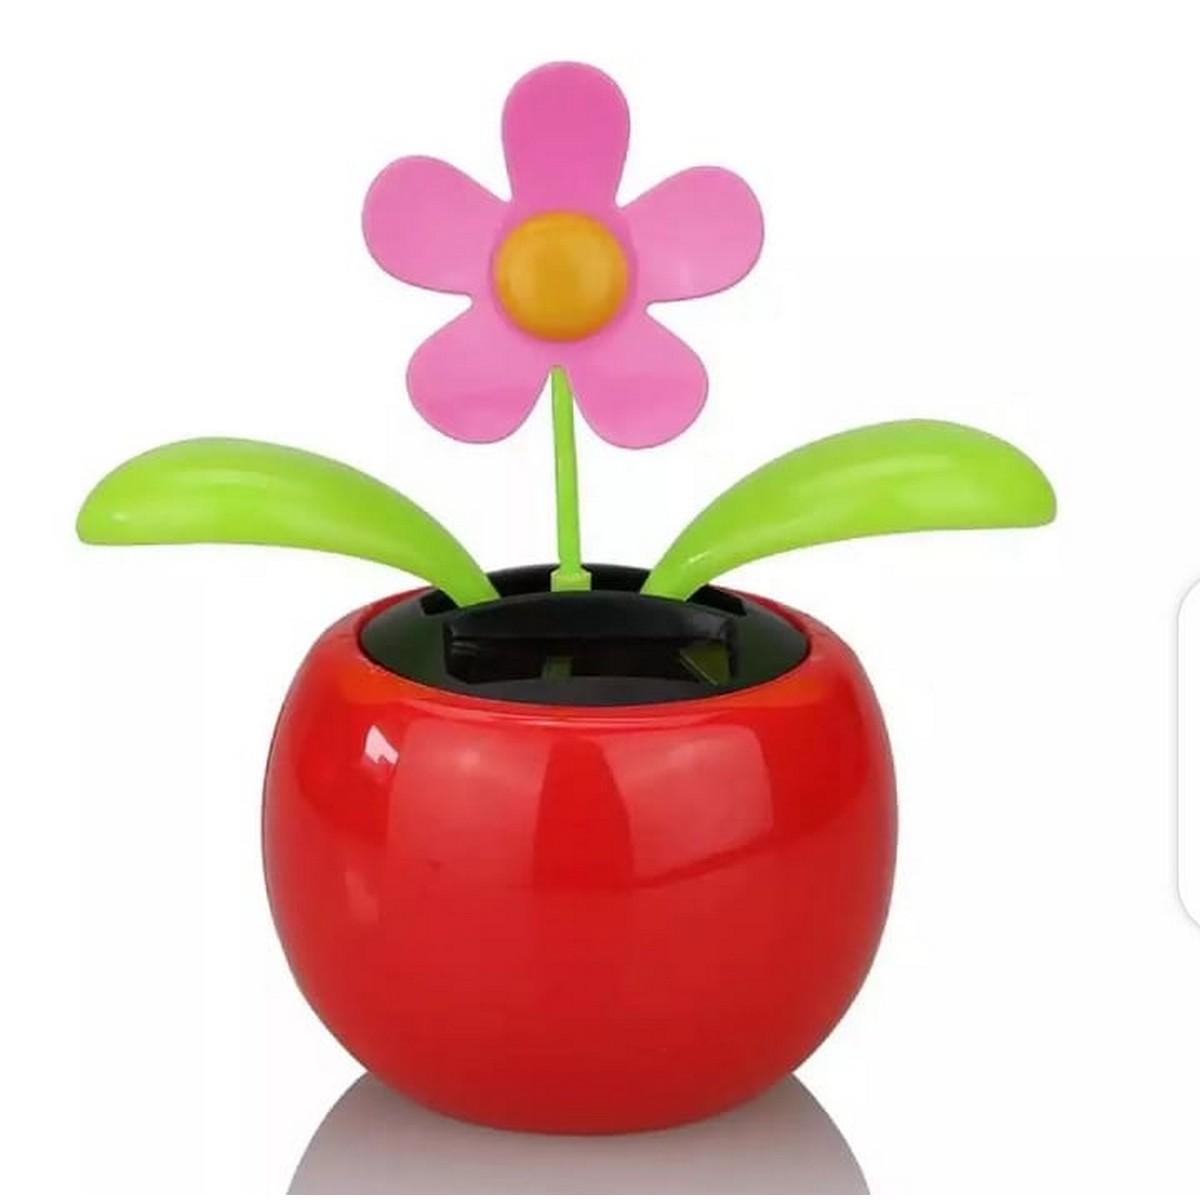 Car Decoration Solar Powered Dancing Flower Swinging Animated Dancer Toy